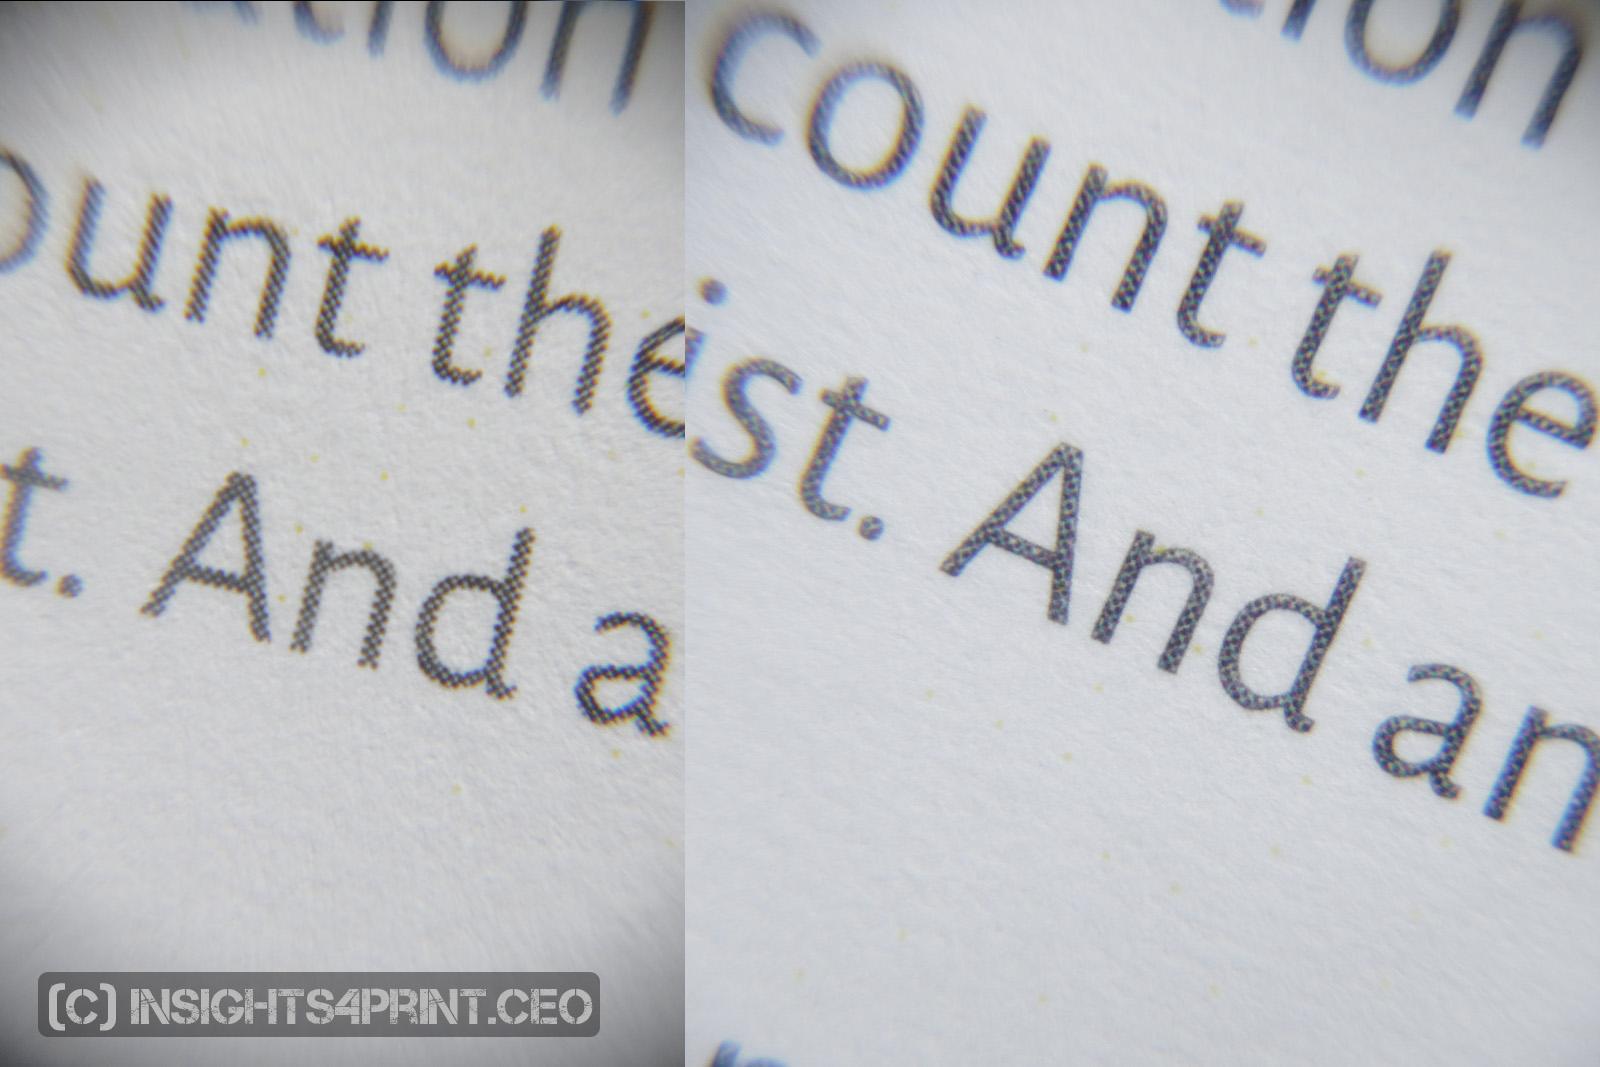 black text: K only vs composite